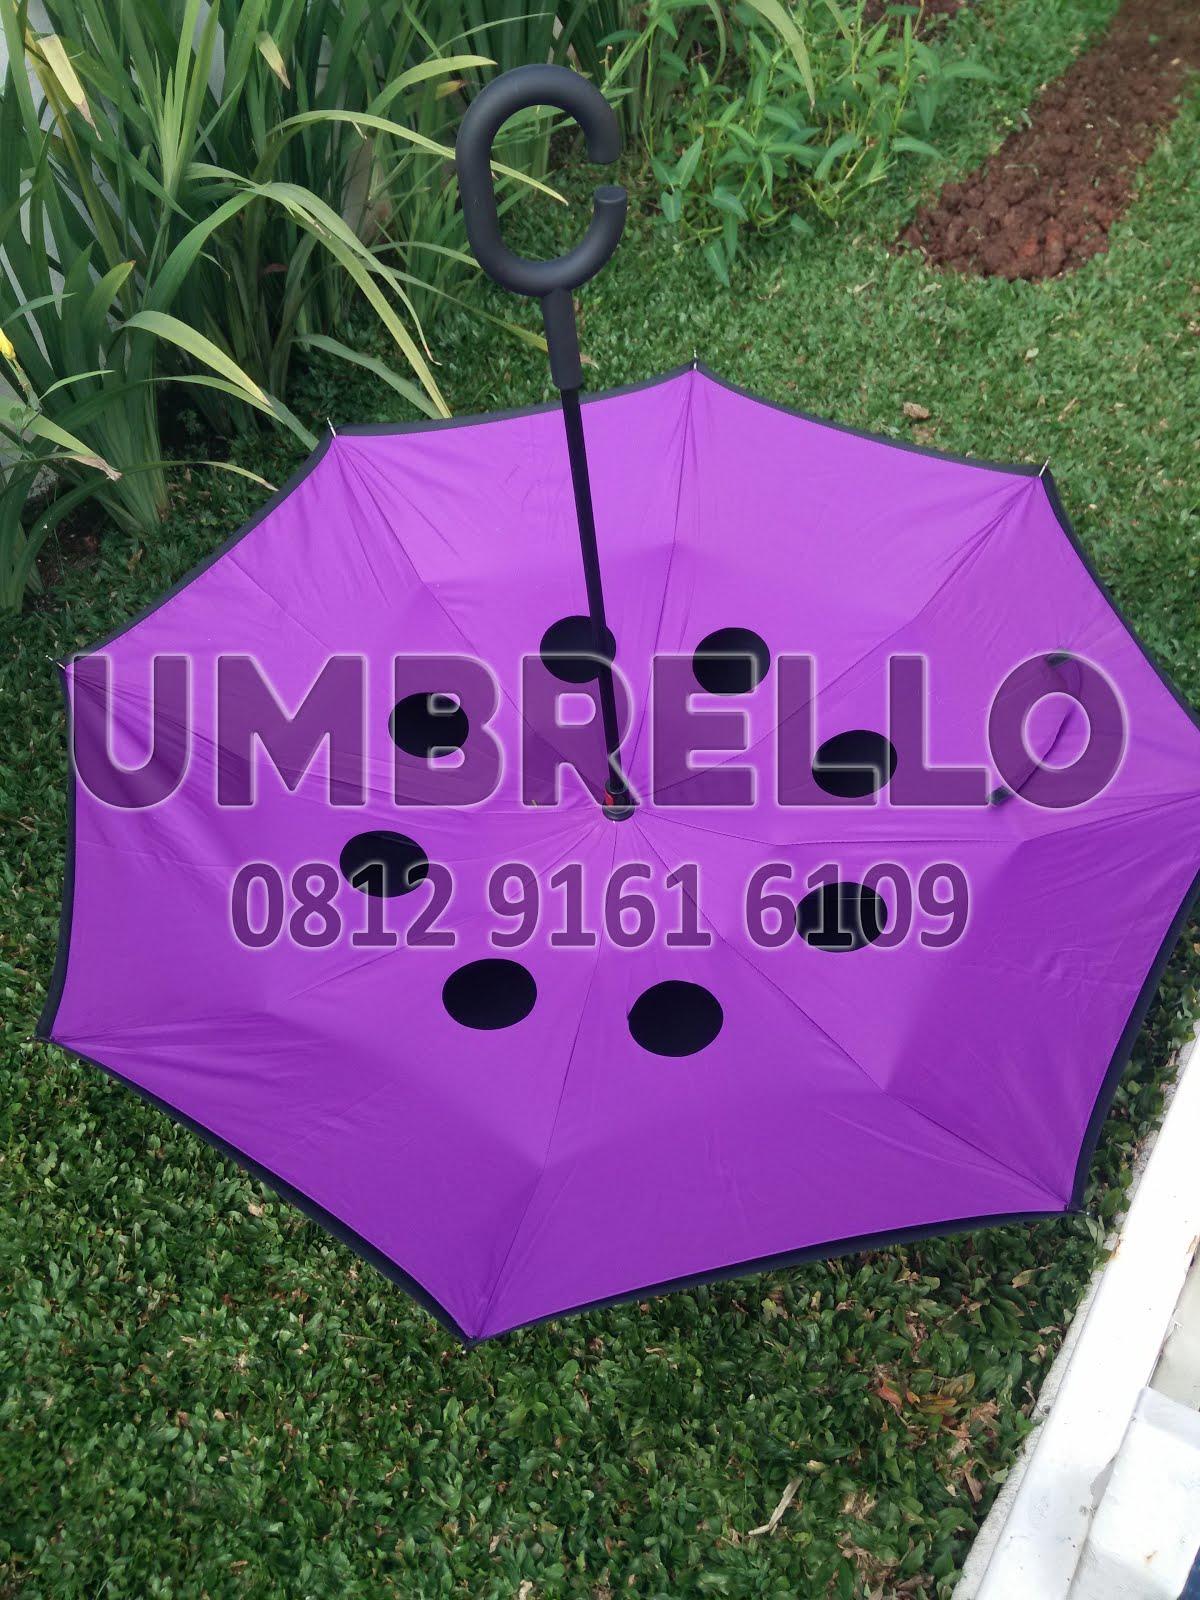 0812 9162 6109 Umbrello Payung Kazbrella Harga Paayungg Hitam Besarr Terbaru Jual Murah